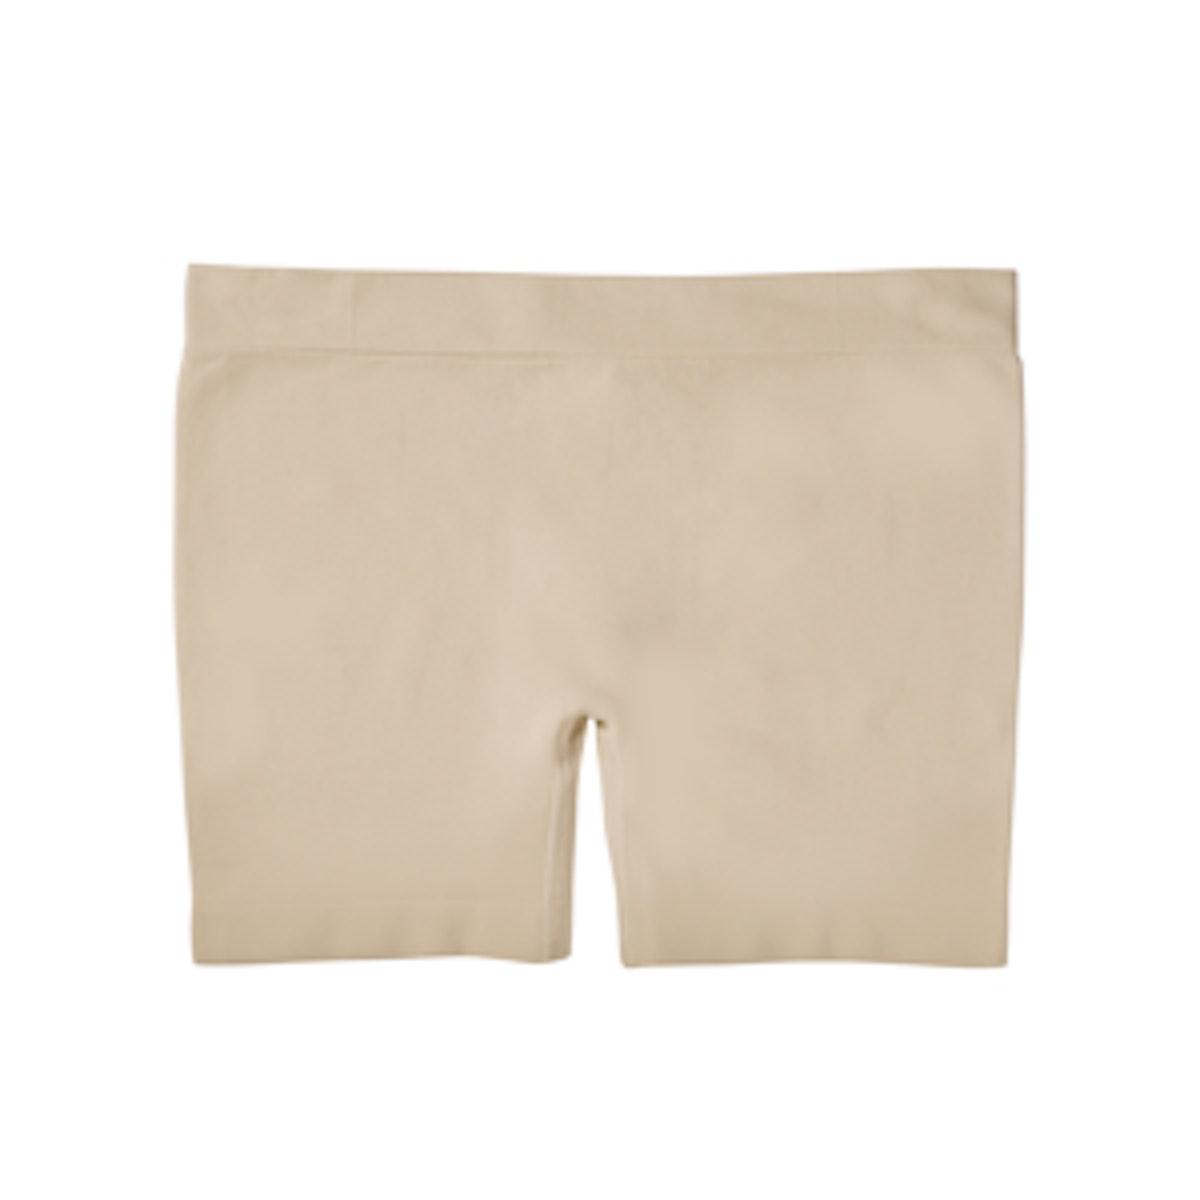 Skimmies Short Length Slipshort